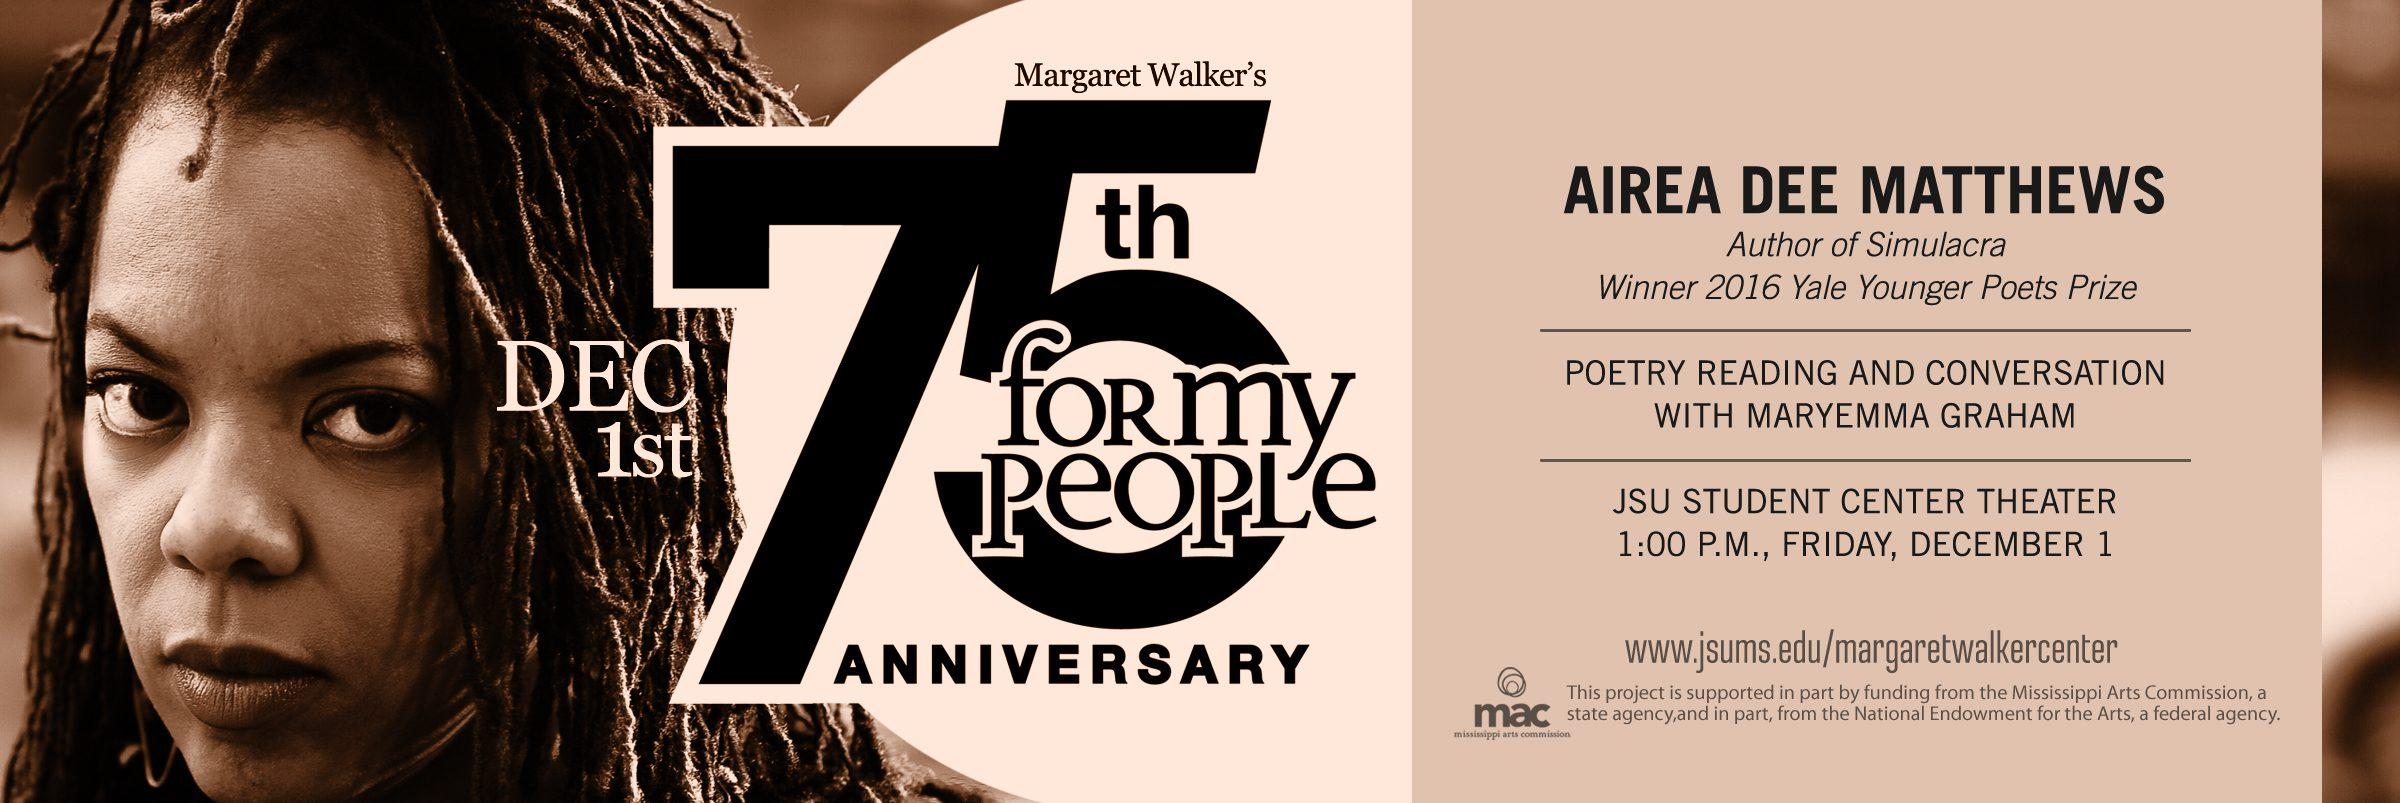 Margaret Walker Center